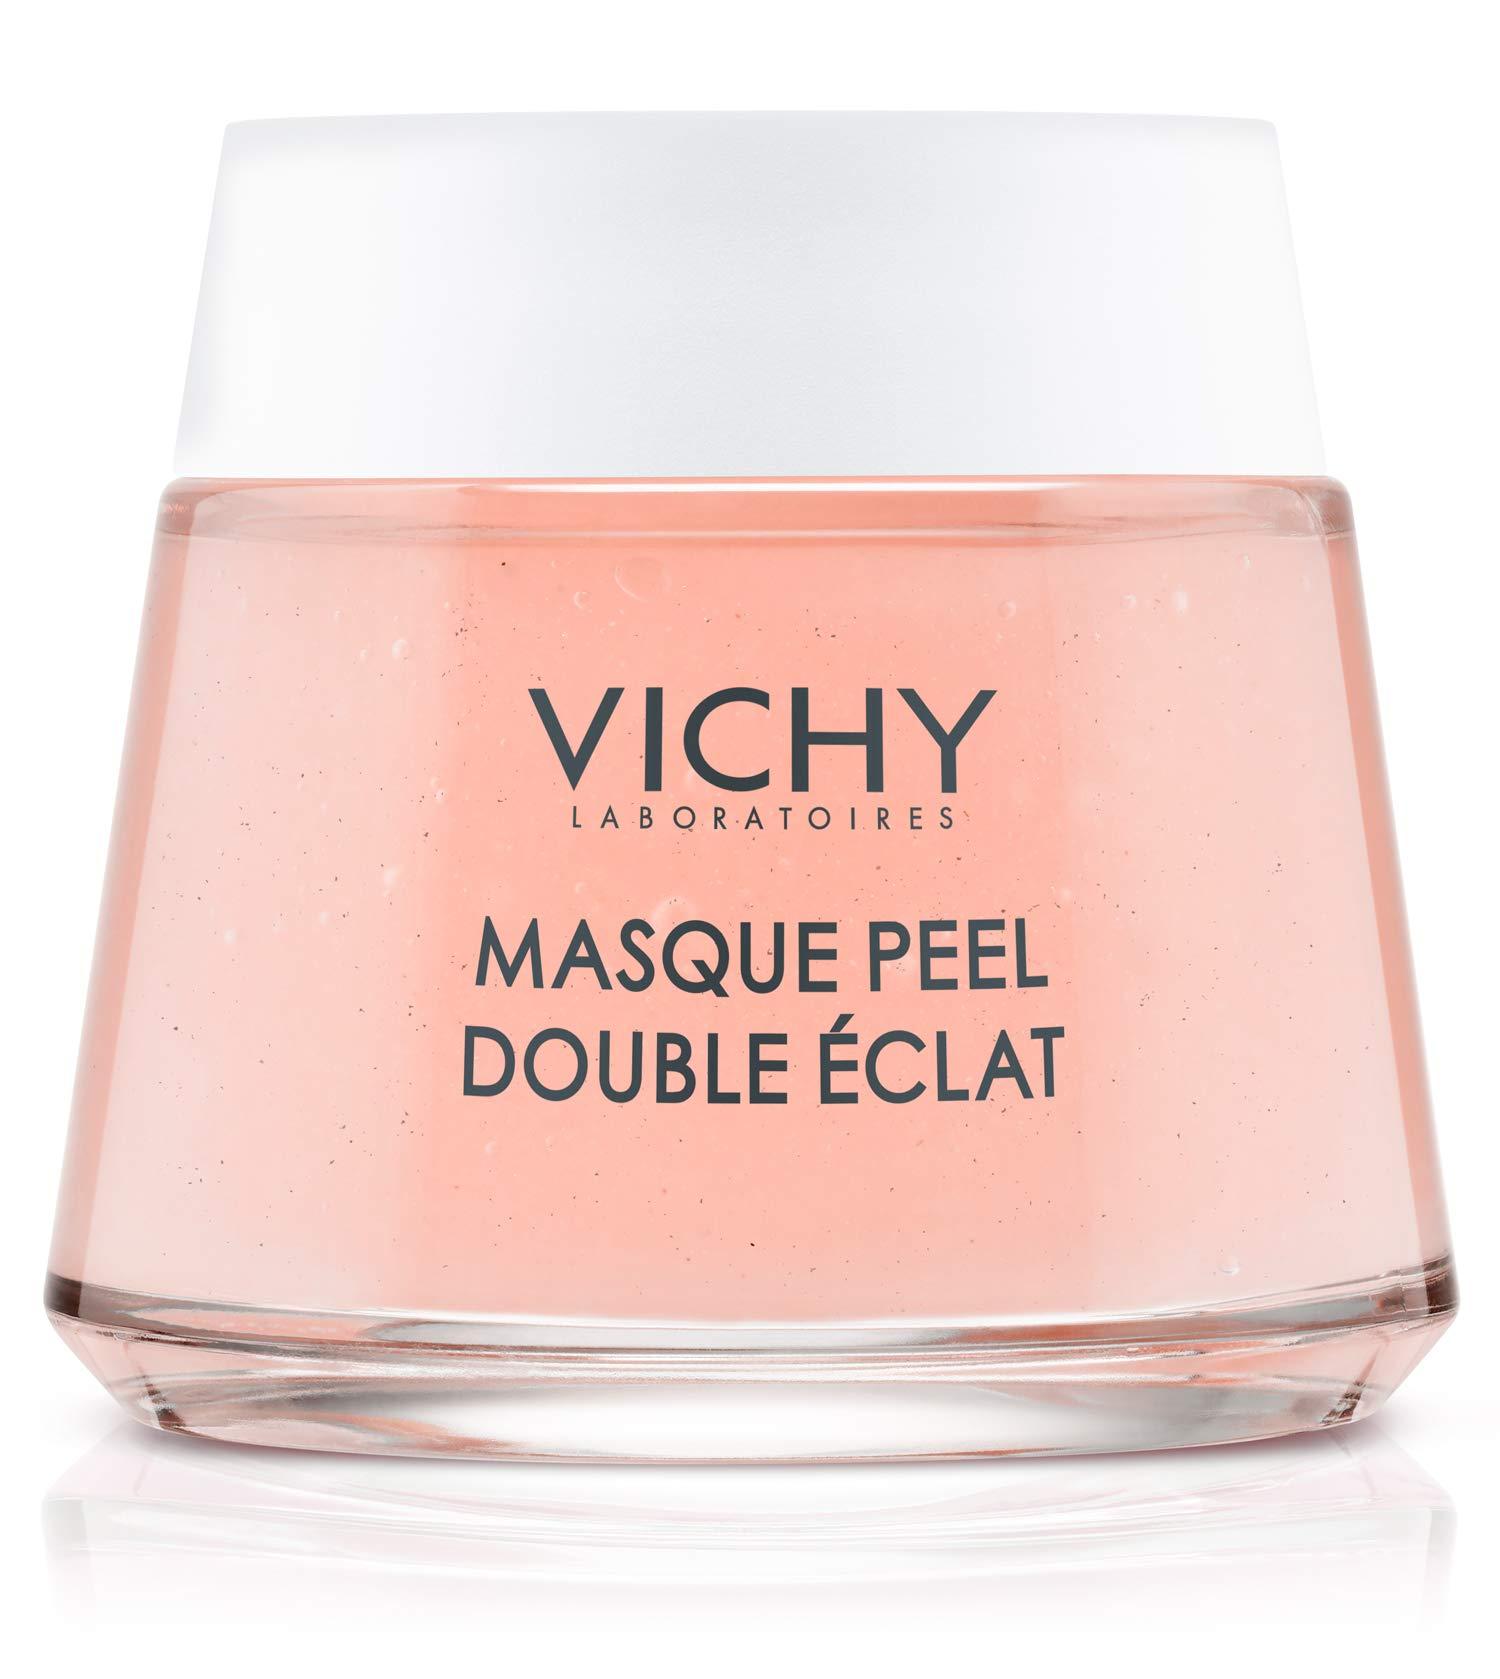 Vichy Mineral Double Glow Peel Face Mask, Oil-Free Mask to Exfoliate & Luminate Skin, Paraben-Free, 2.54 Fl. Oz.